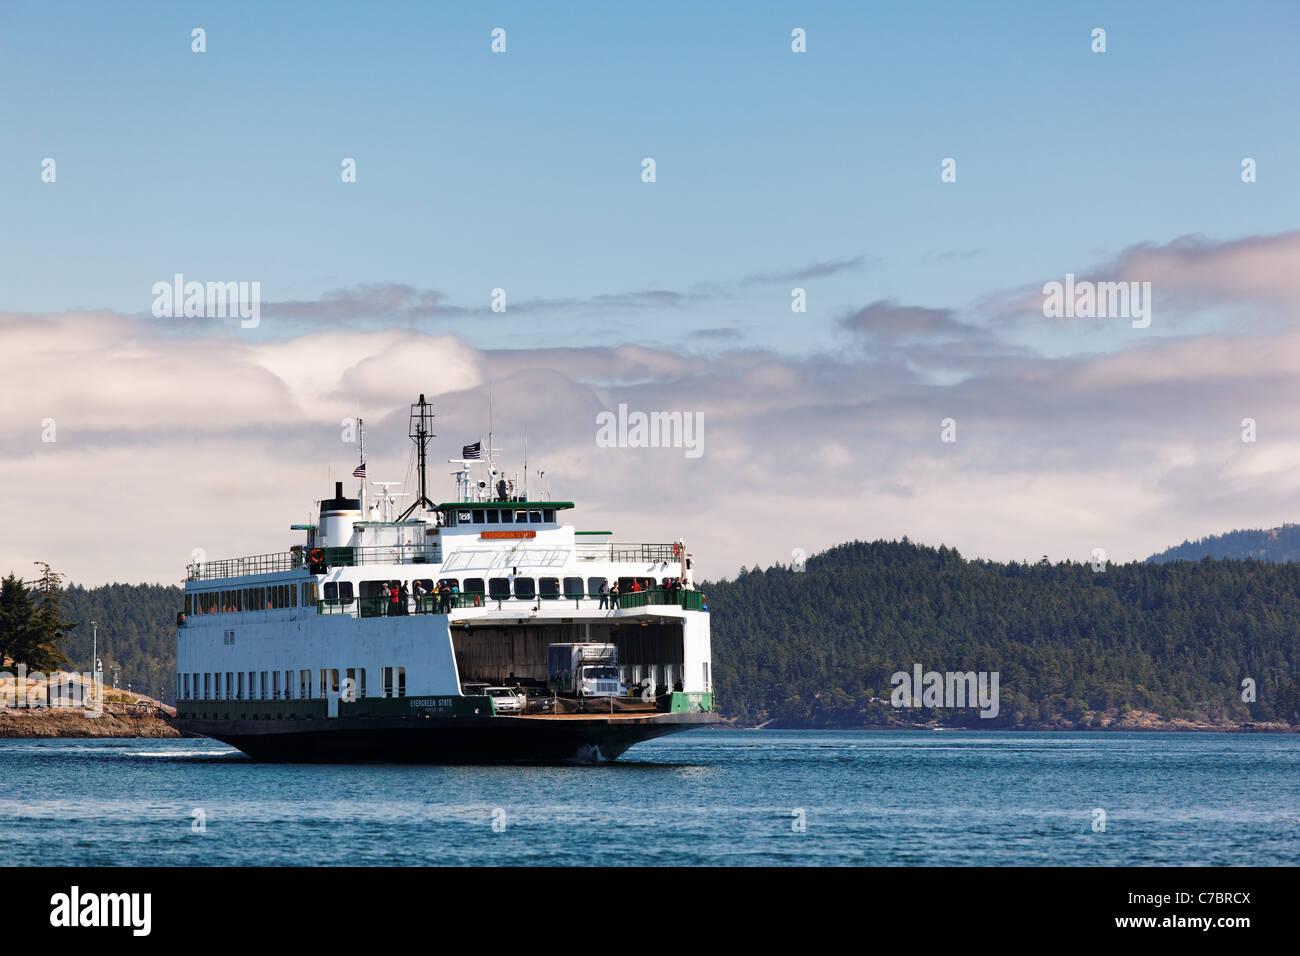 Washington State ferry MV Evergreen State arriving at Friday Harbor, San Juan County, Washington. USA - Stock Image